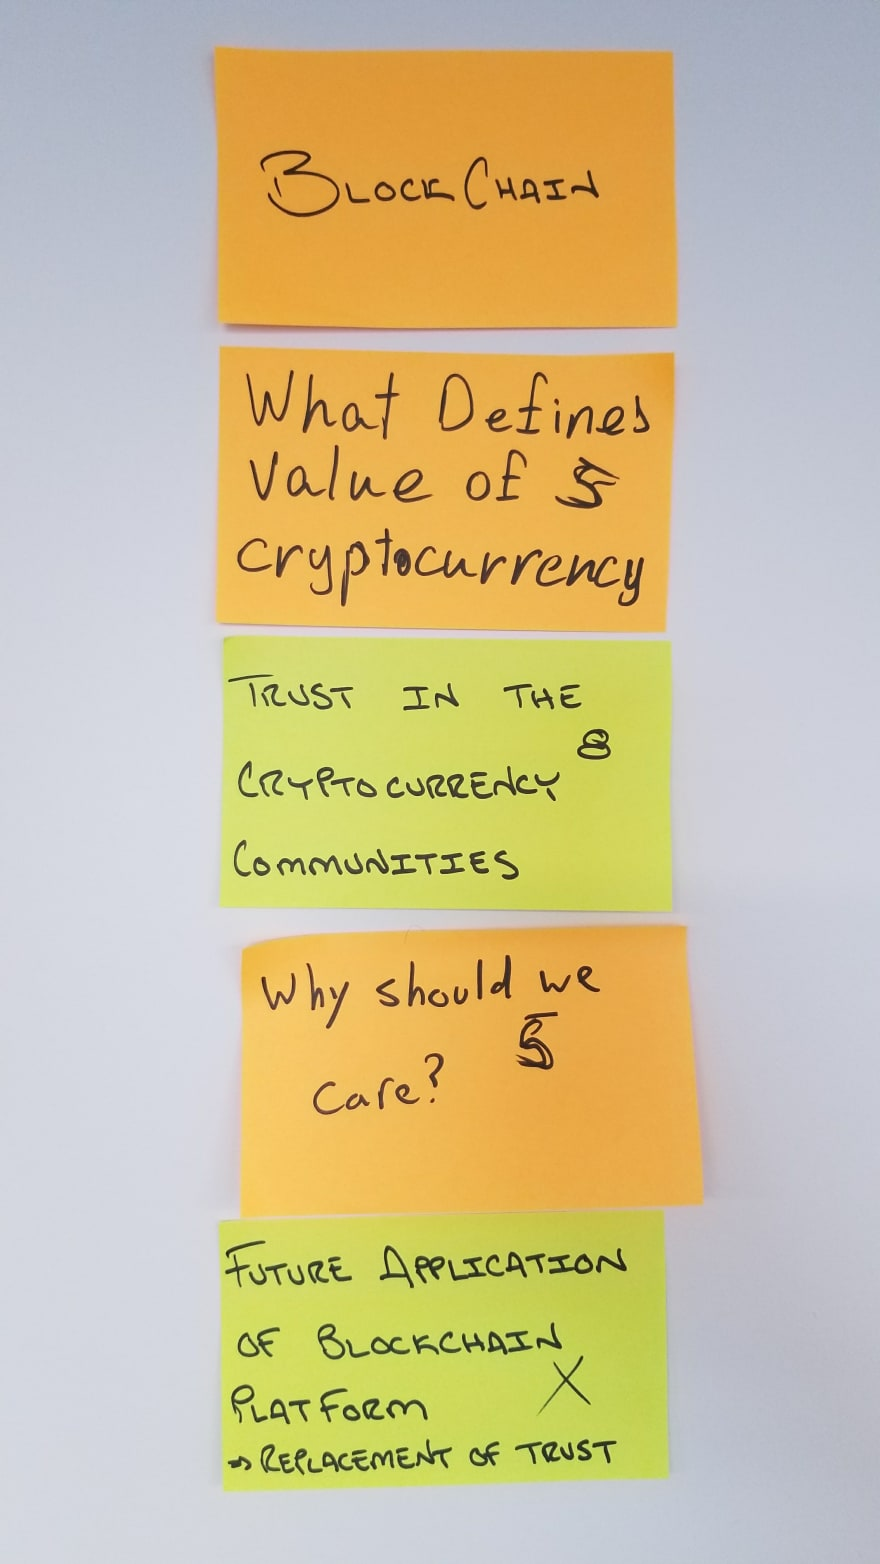 lean coffee topics for blockchain